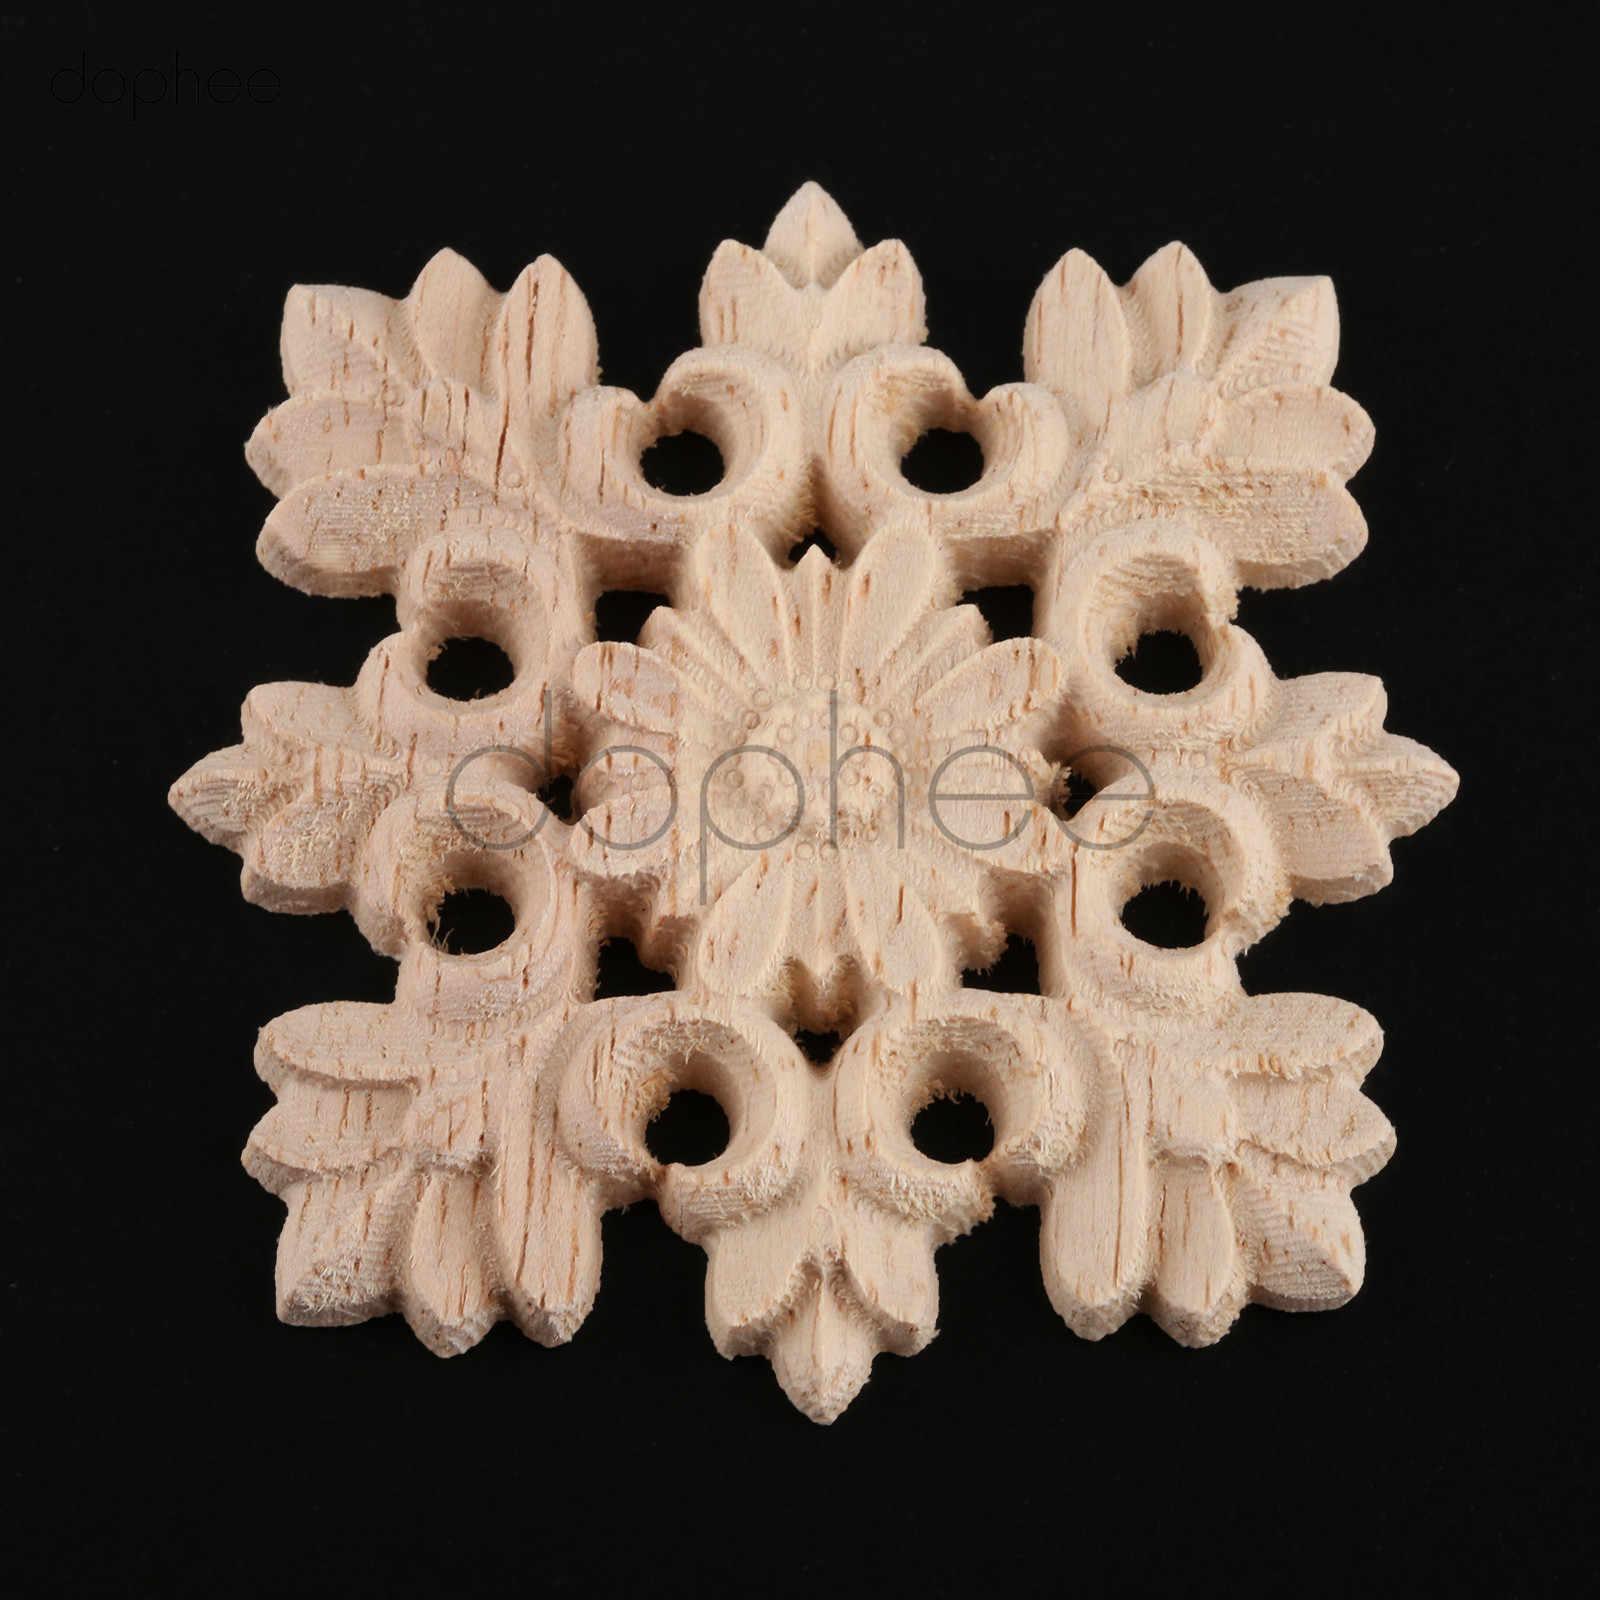 Figurines Woodcarving Corner Decal Onlay Furniture Frame Applique Carved Decor